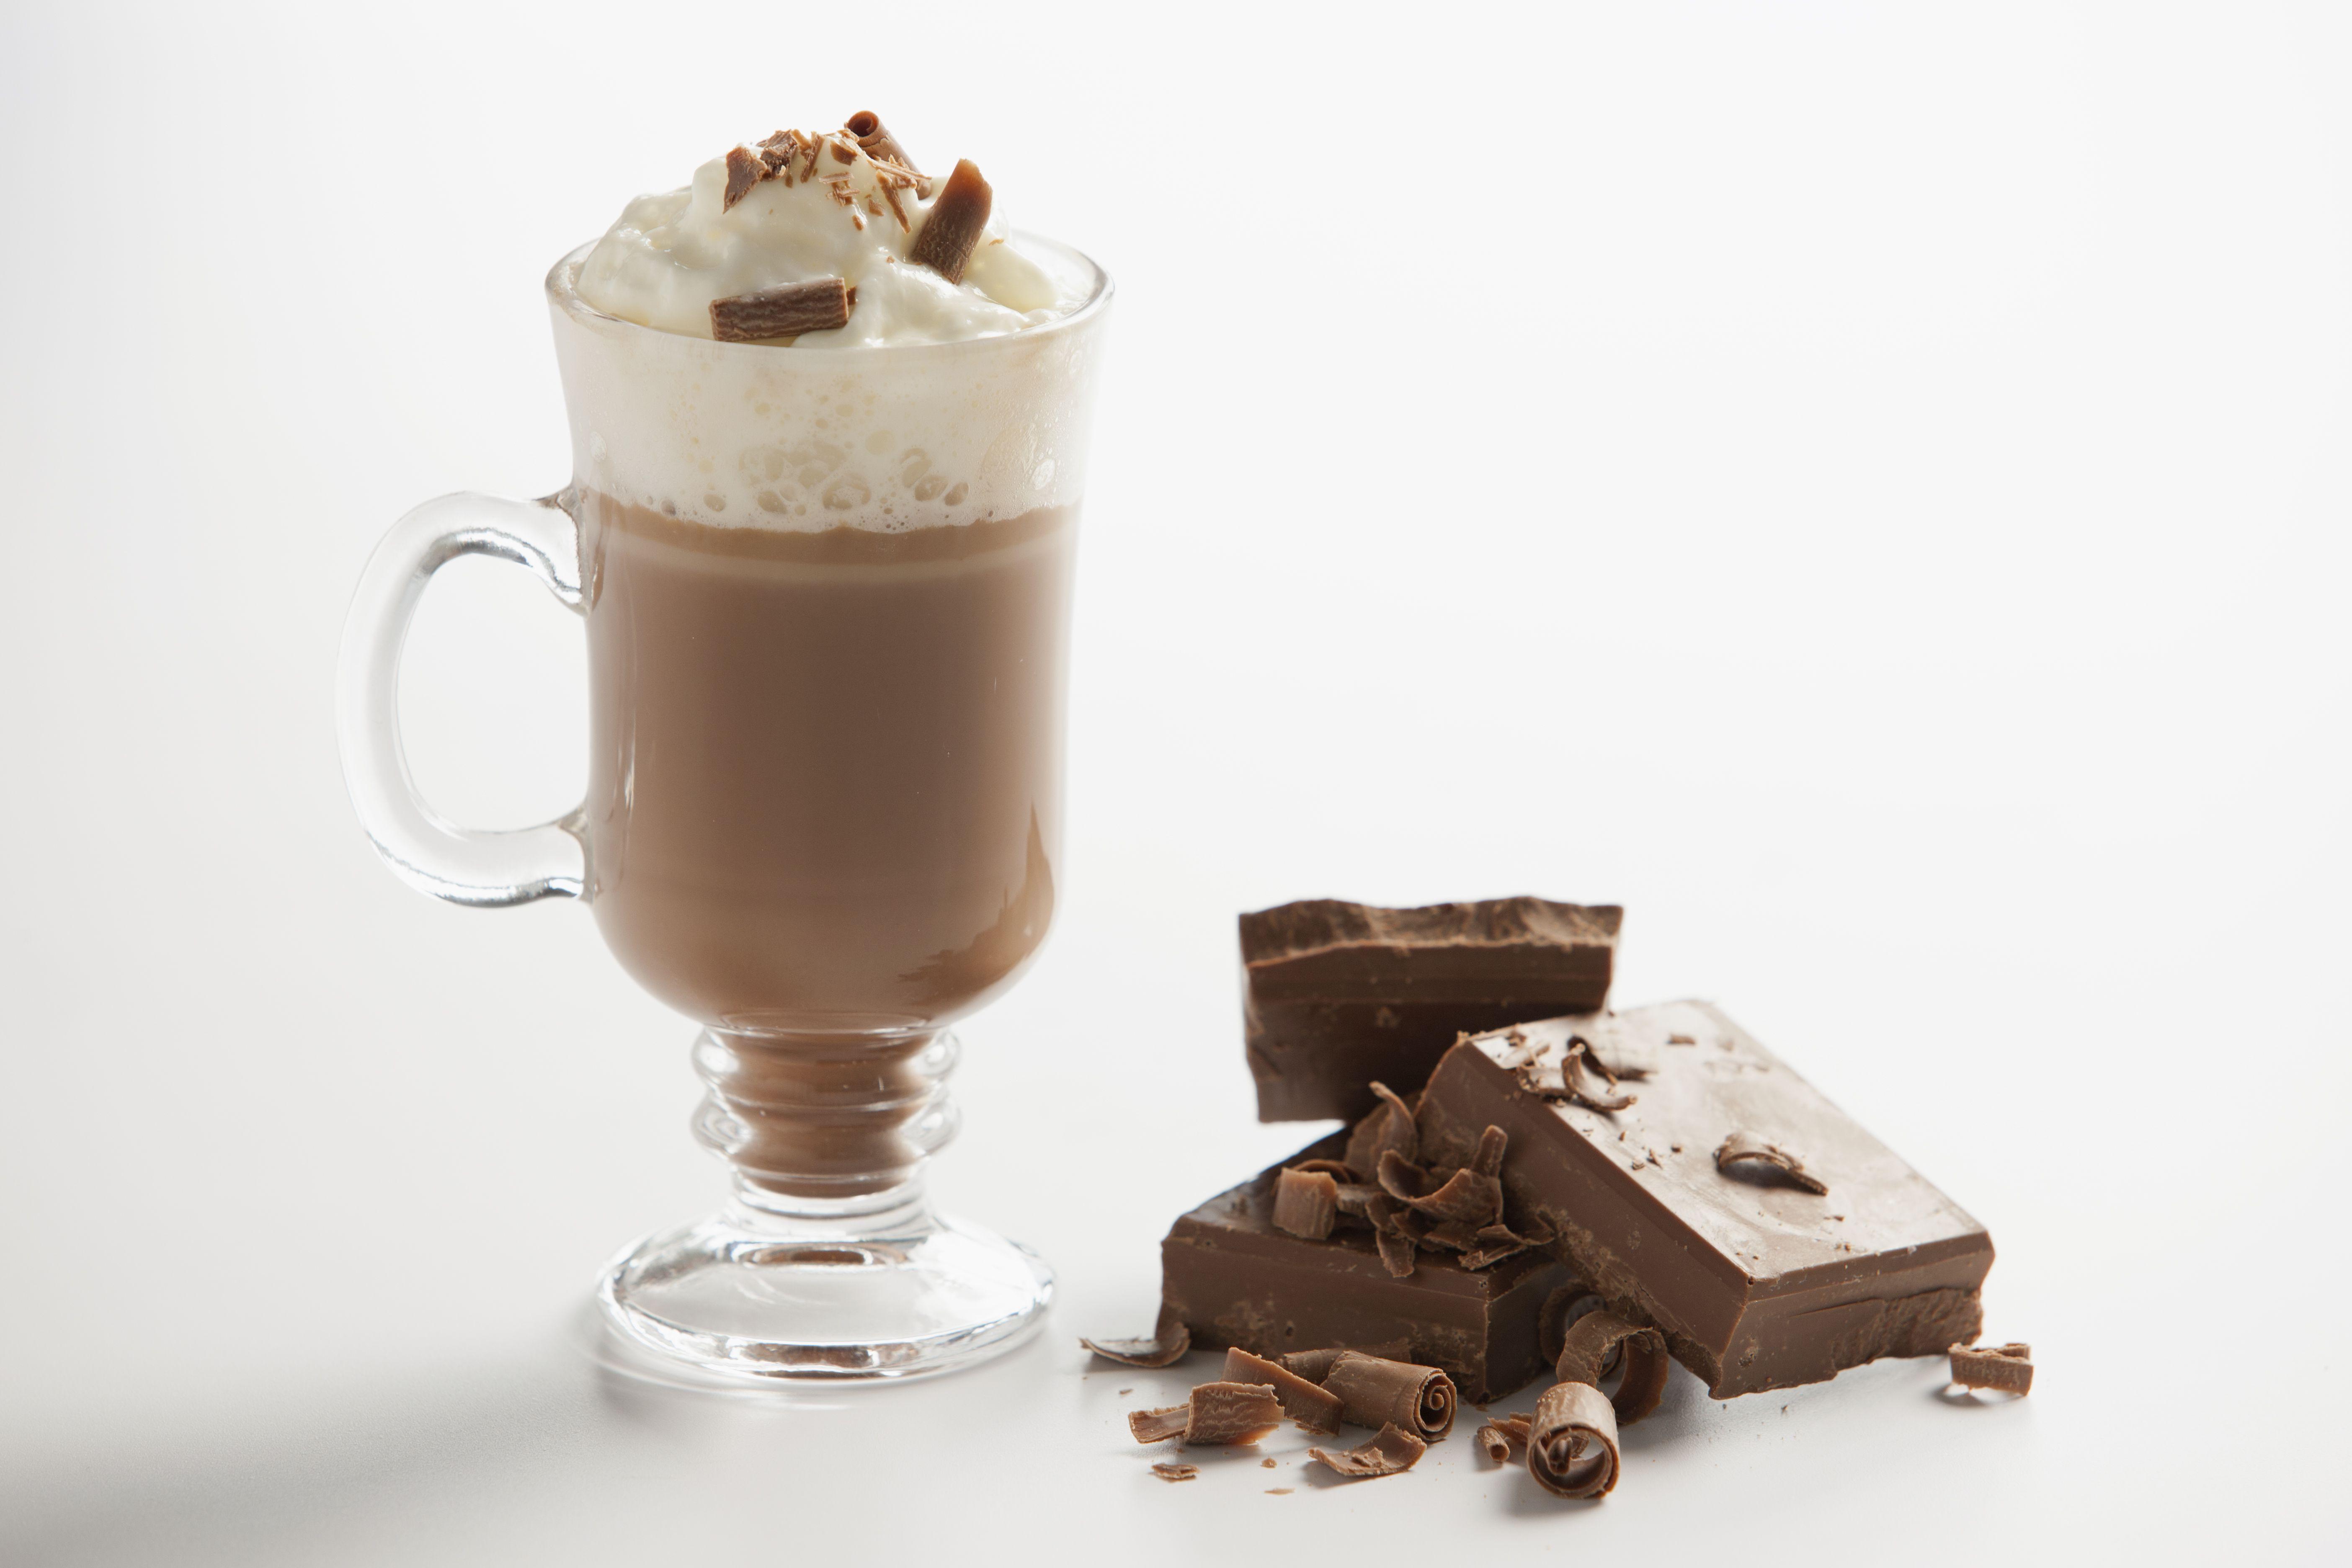 Cikolata Milkshake Tarifi Ve Boyama Sayfalari